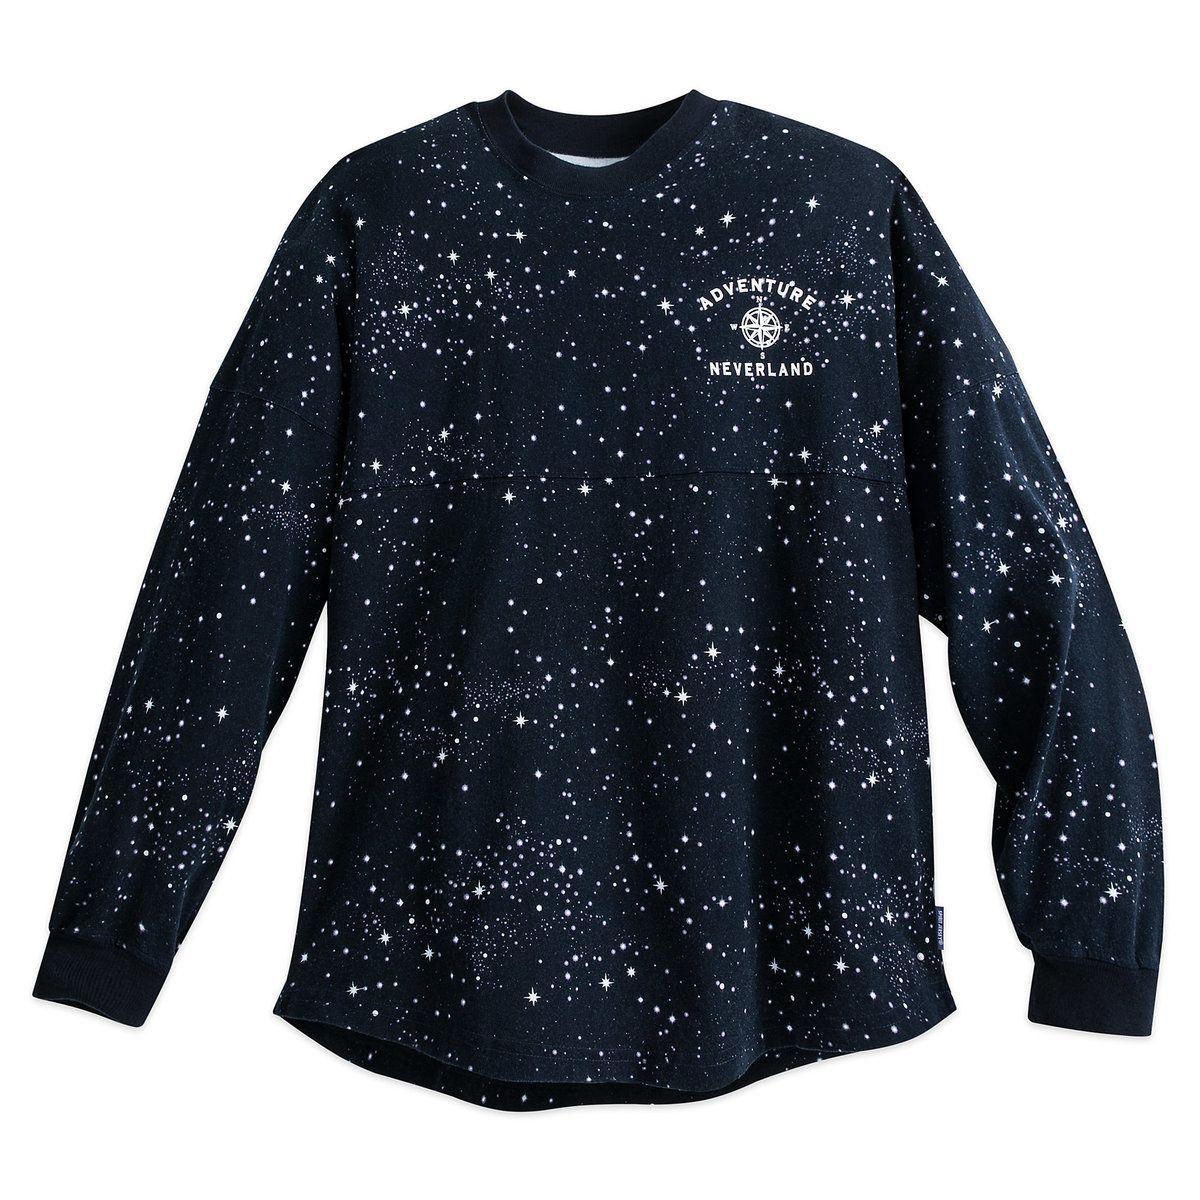 e6f440b5137 Peter Pan Long Sleeve Spirit Jersey - Women | My Style: Sweaters ...